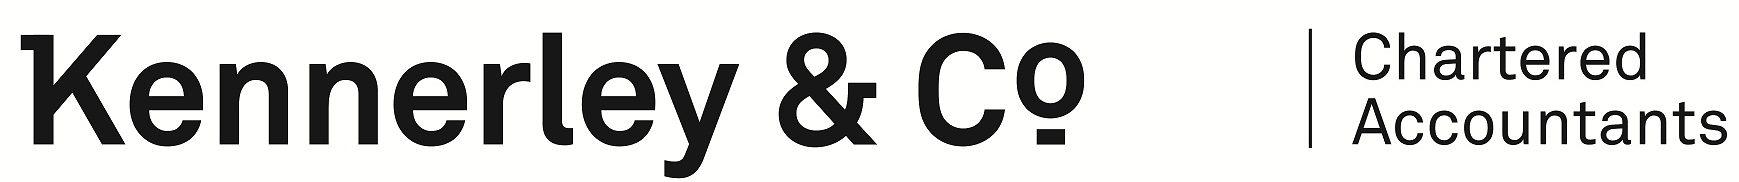 Kennerley & Co Chartered Accountants – Mt Eden